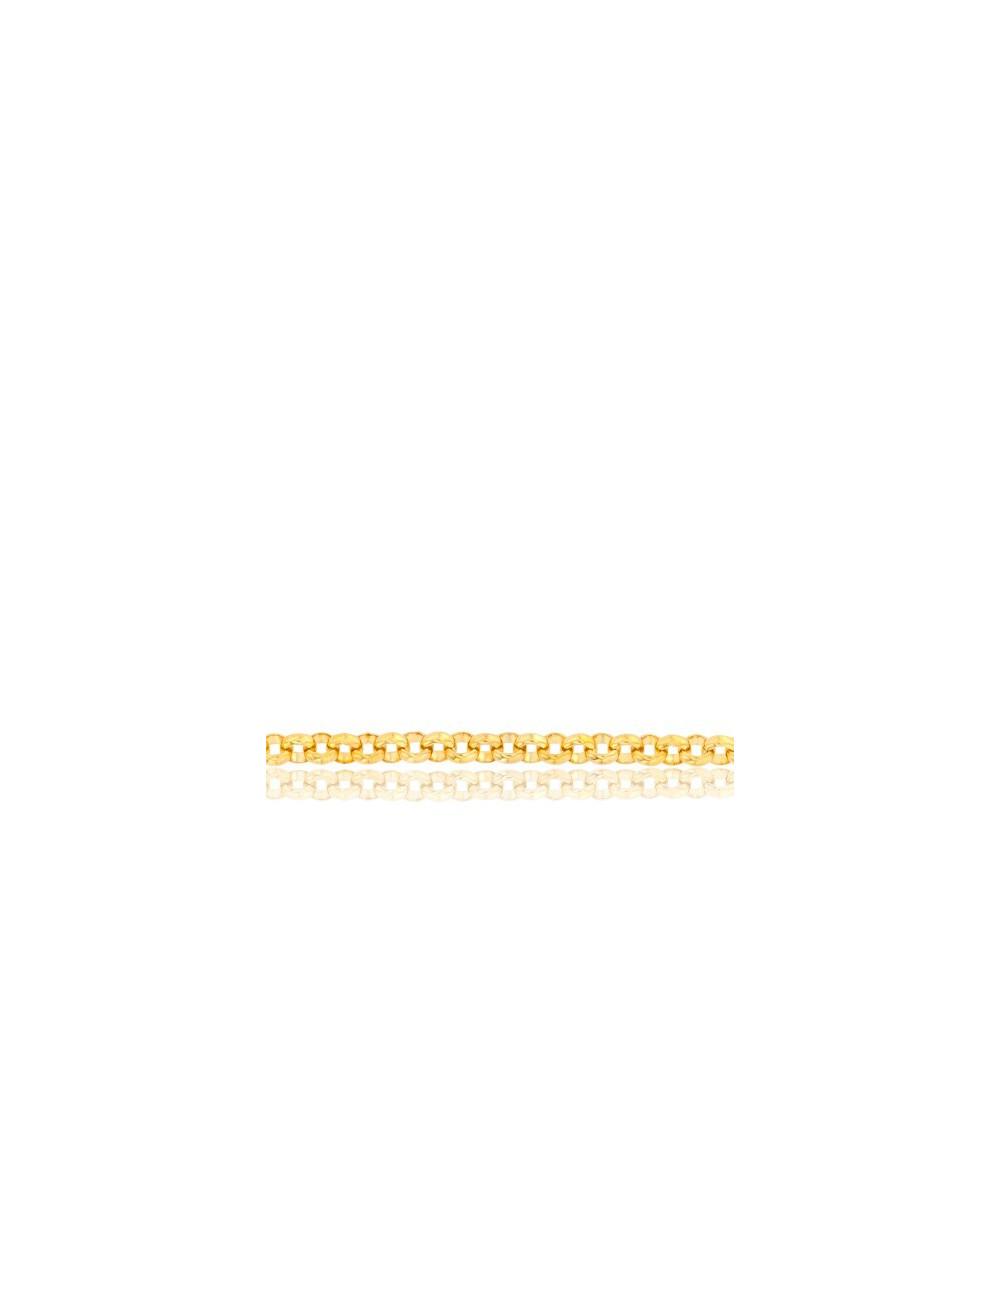 Chaîne Jaseron 1 3 mm Or Jaune 18K